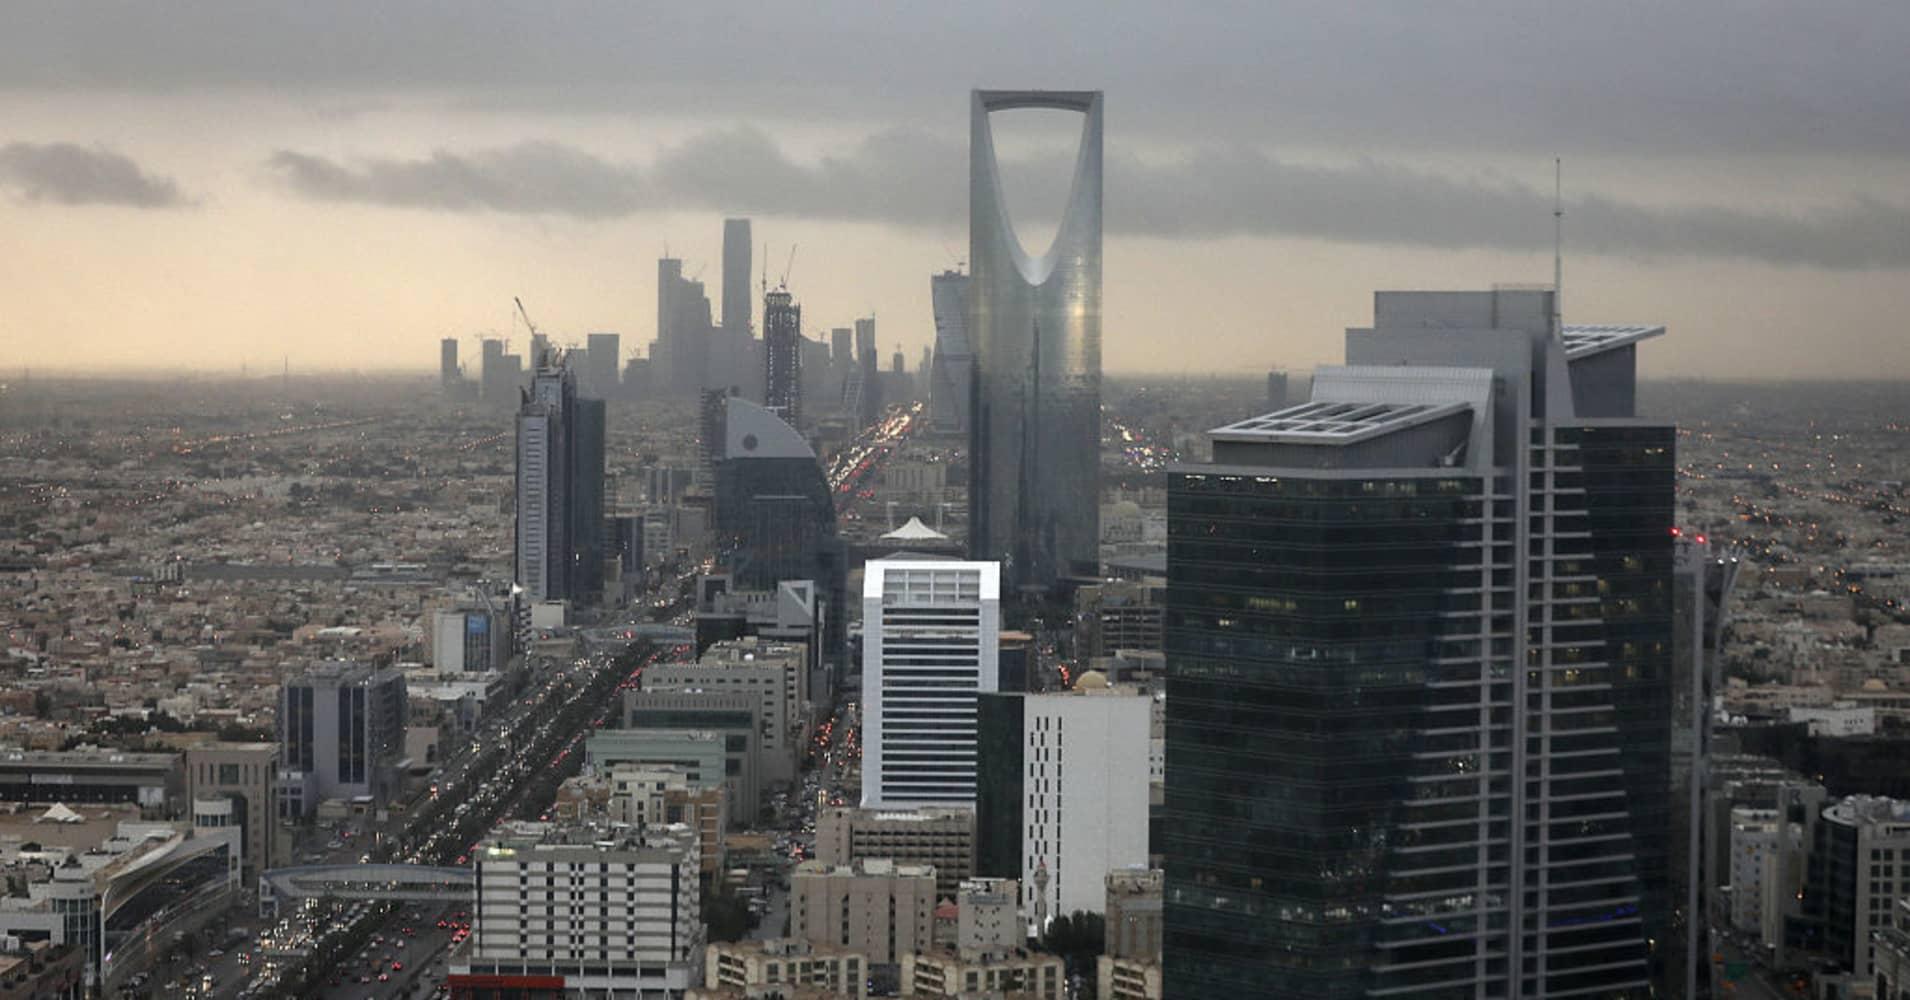 Saudi's $500 billion mega-city NEOM is attracting 'overwhelming